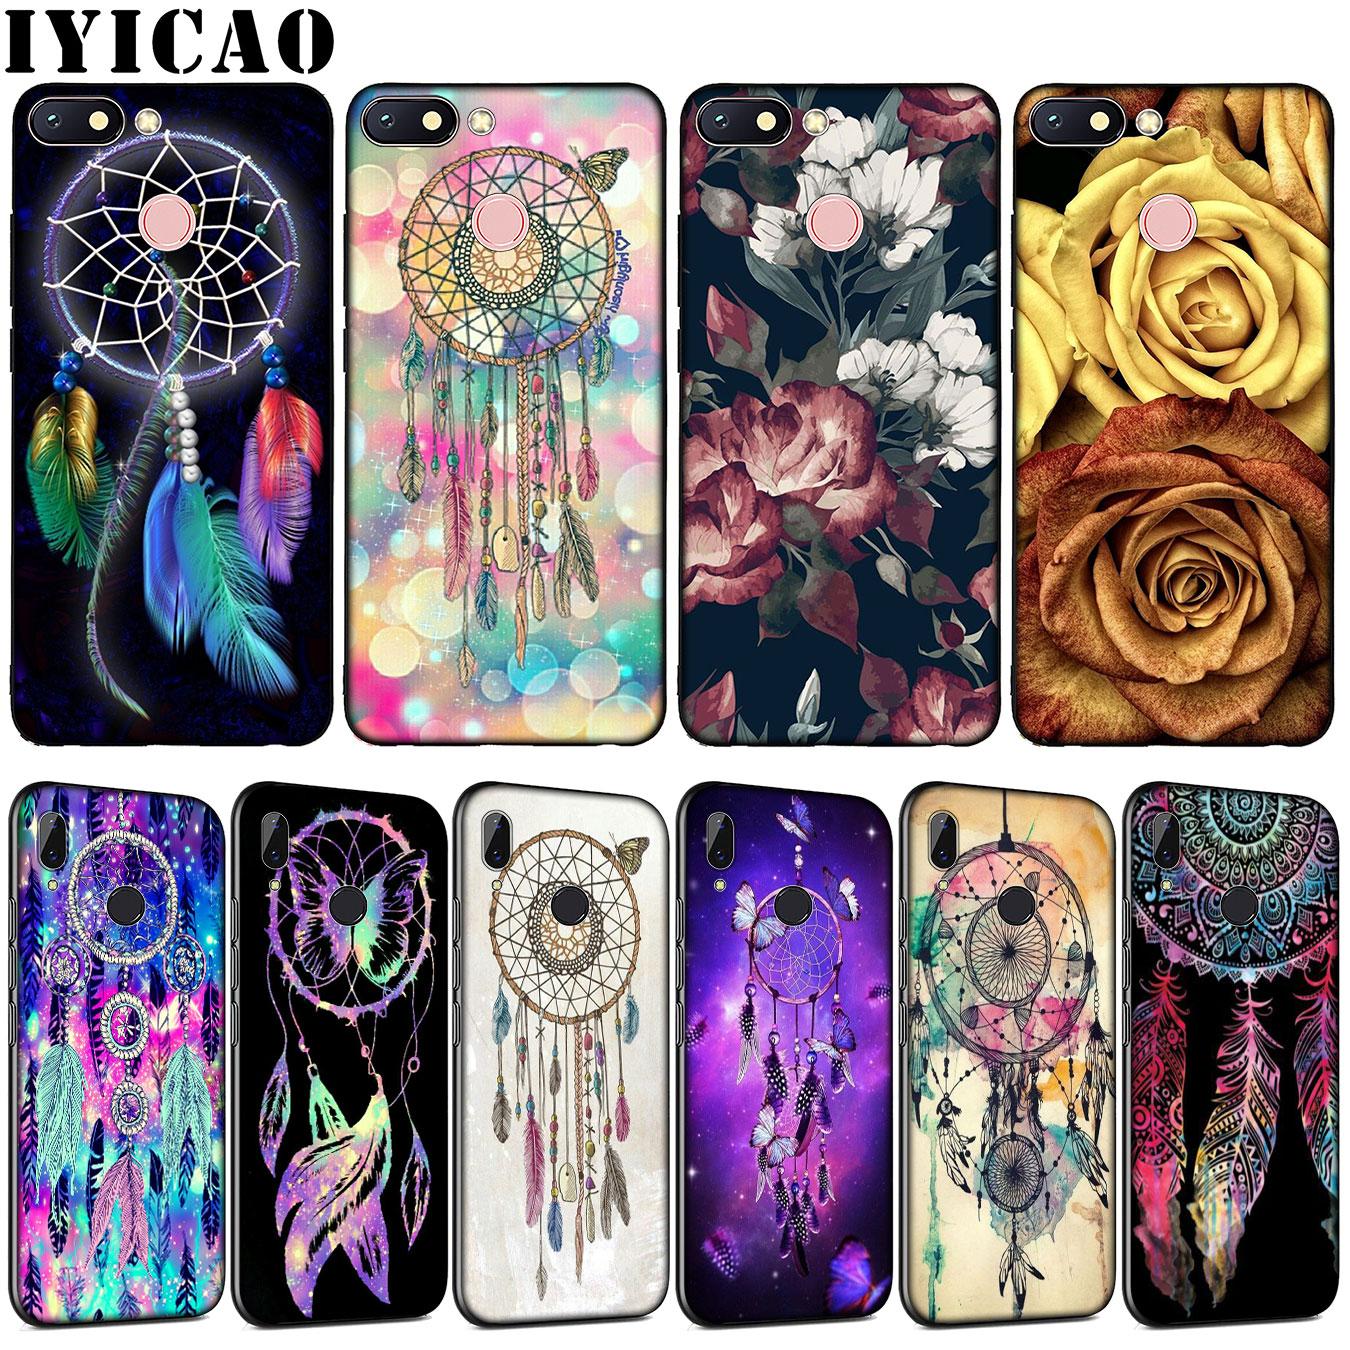 Dream Catcher Watercolor Dreamcatcher Softsilicone Phone Case For Xiaomi Redmi Note 8 8A 8T 7 7A 6 6A 5 5A GO S2 K30 K20 Pro